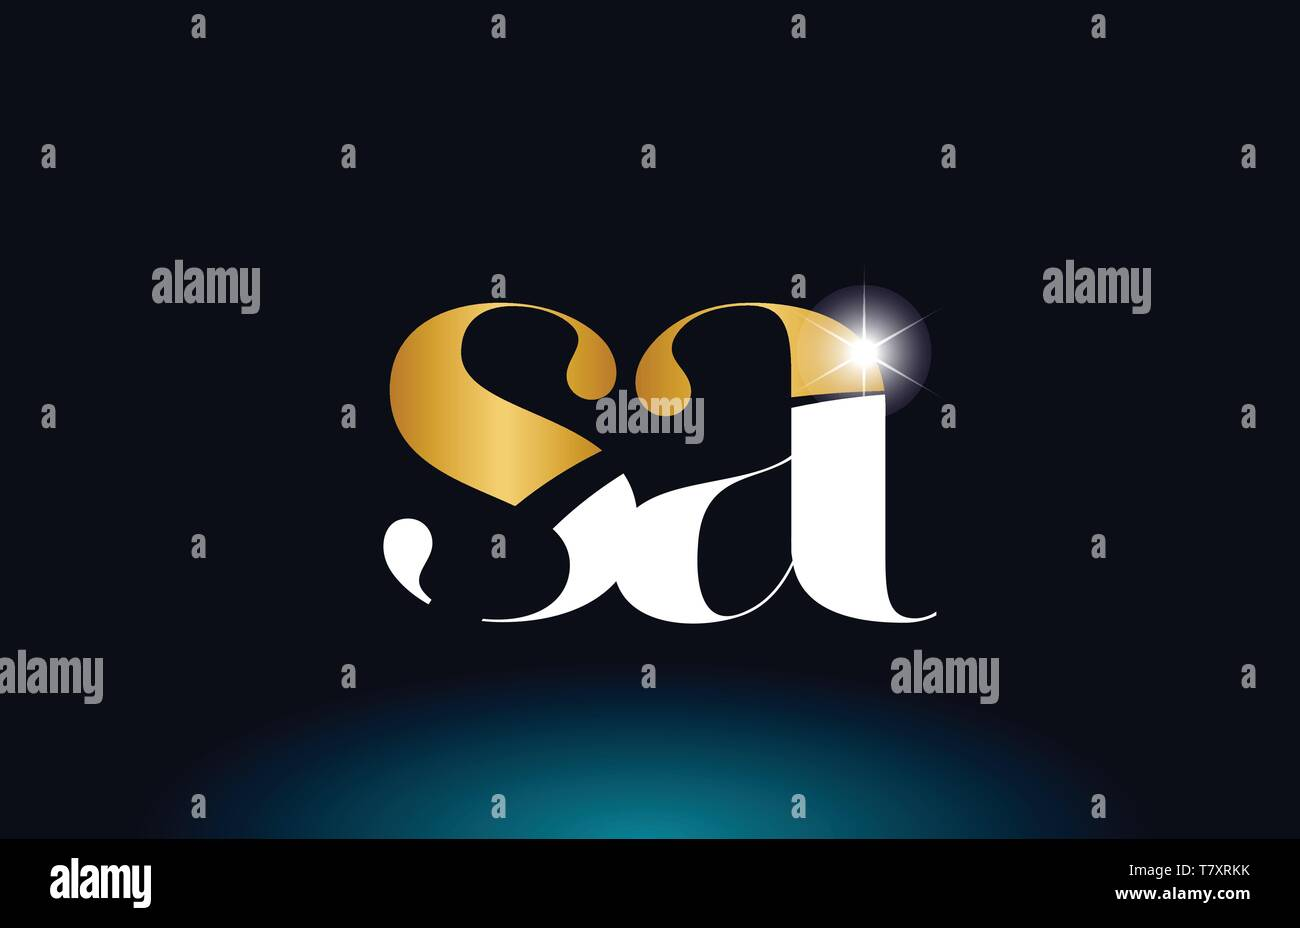 gold golden alphabet letter sa s a logo icon combination design suitable for a company or business - Stock Vector